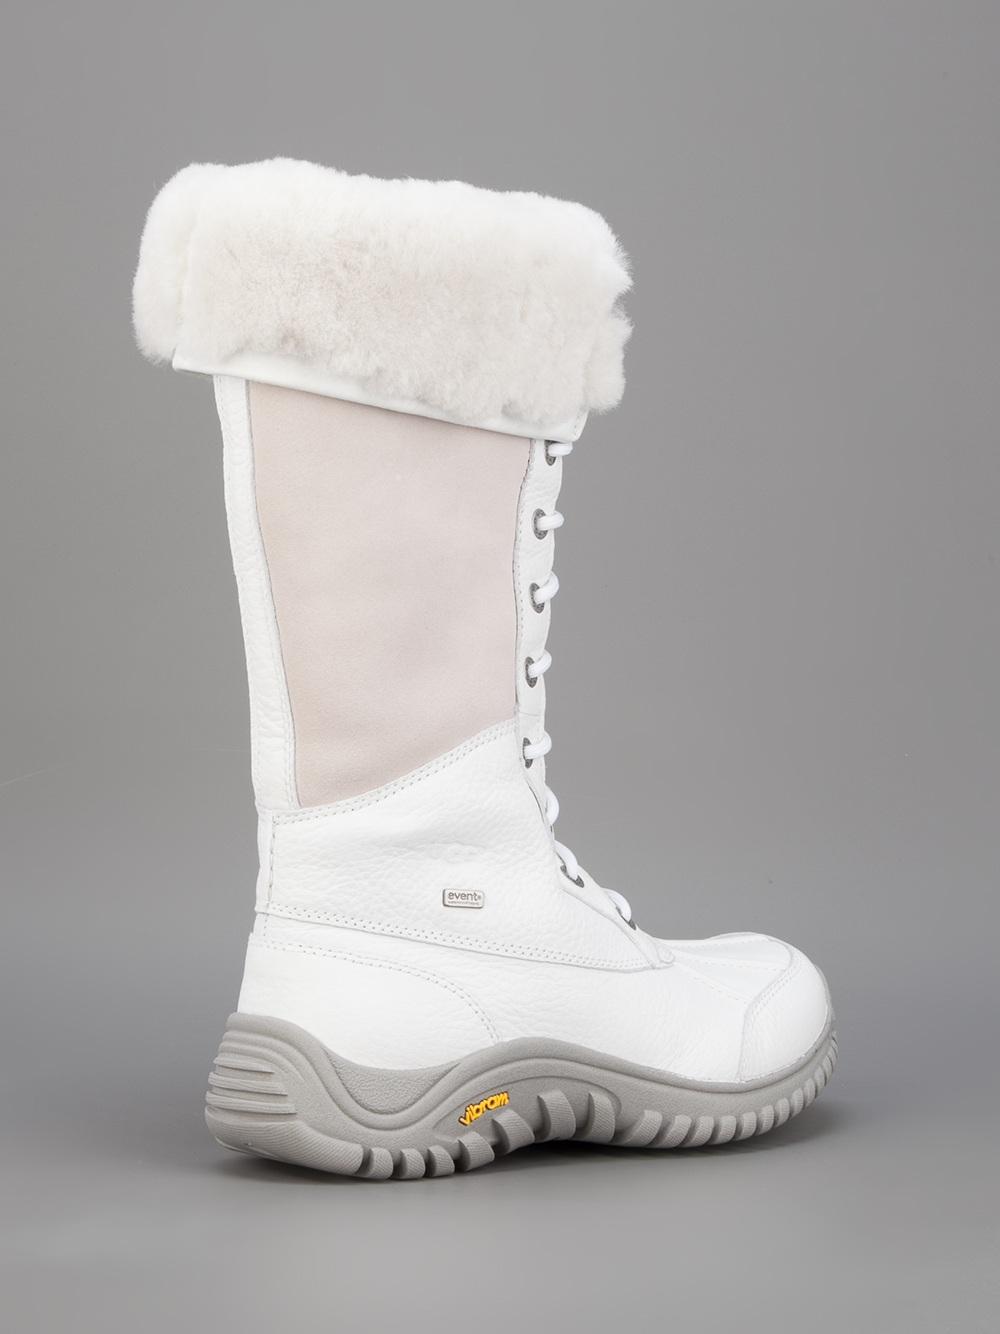 Ugg Adirondack Snow Boot In White - Lyst-3677